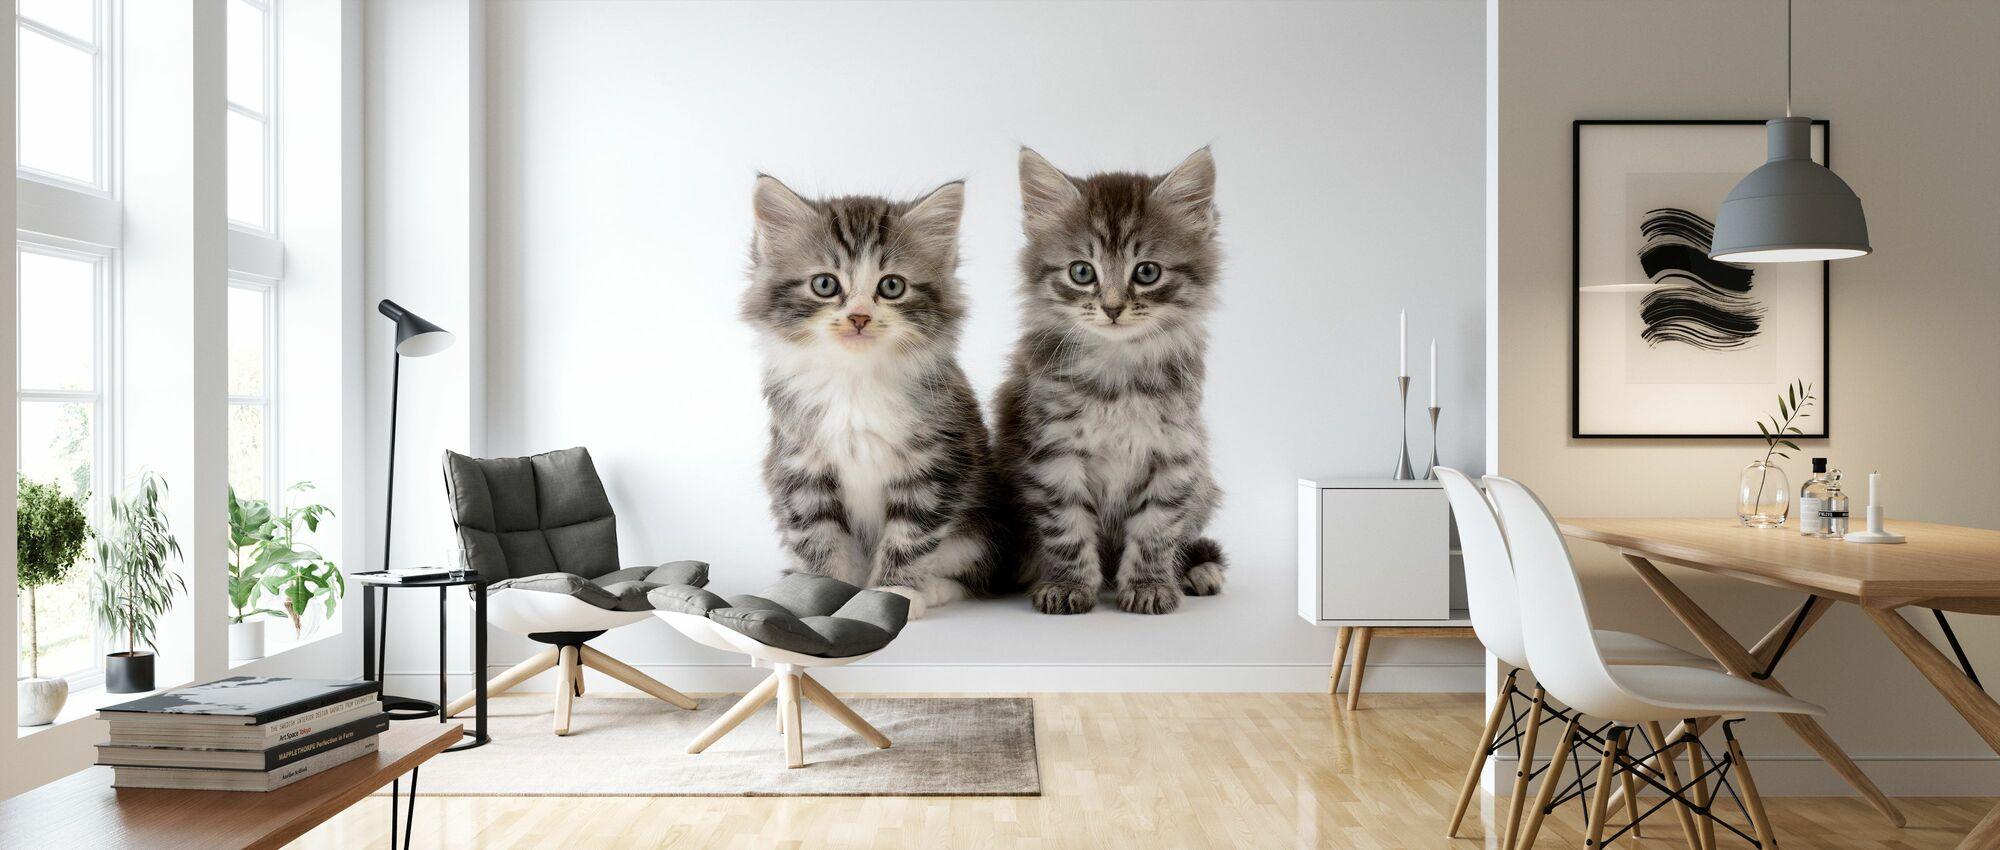 Katten Witte Achtergrond - Behang - Woonkamer